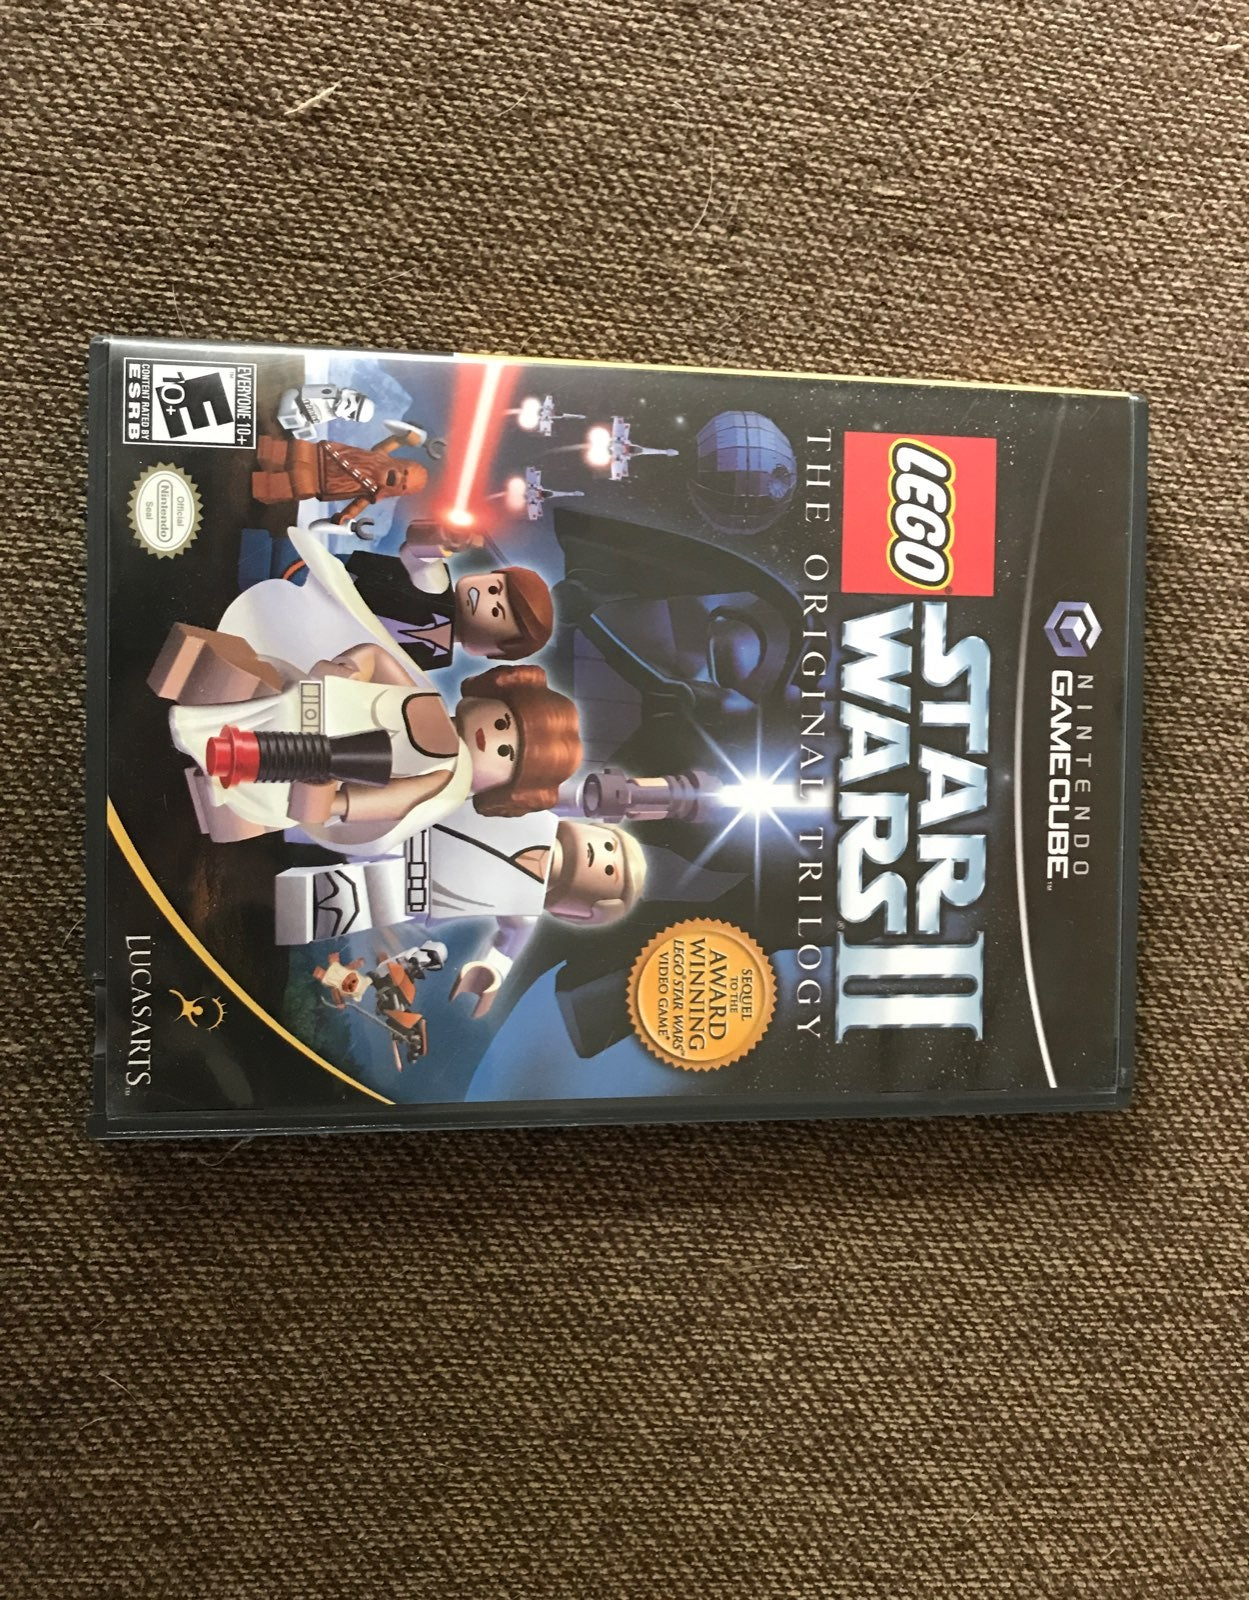 Gamecube lego star wars 2 disc